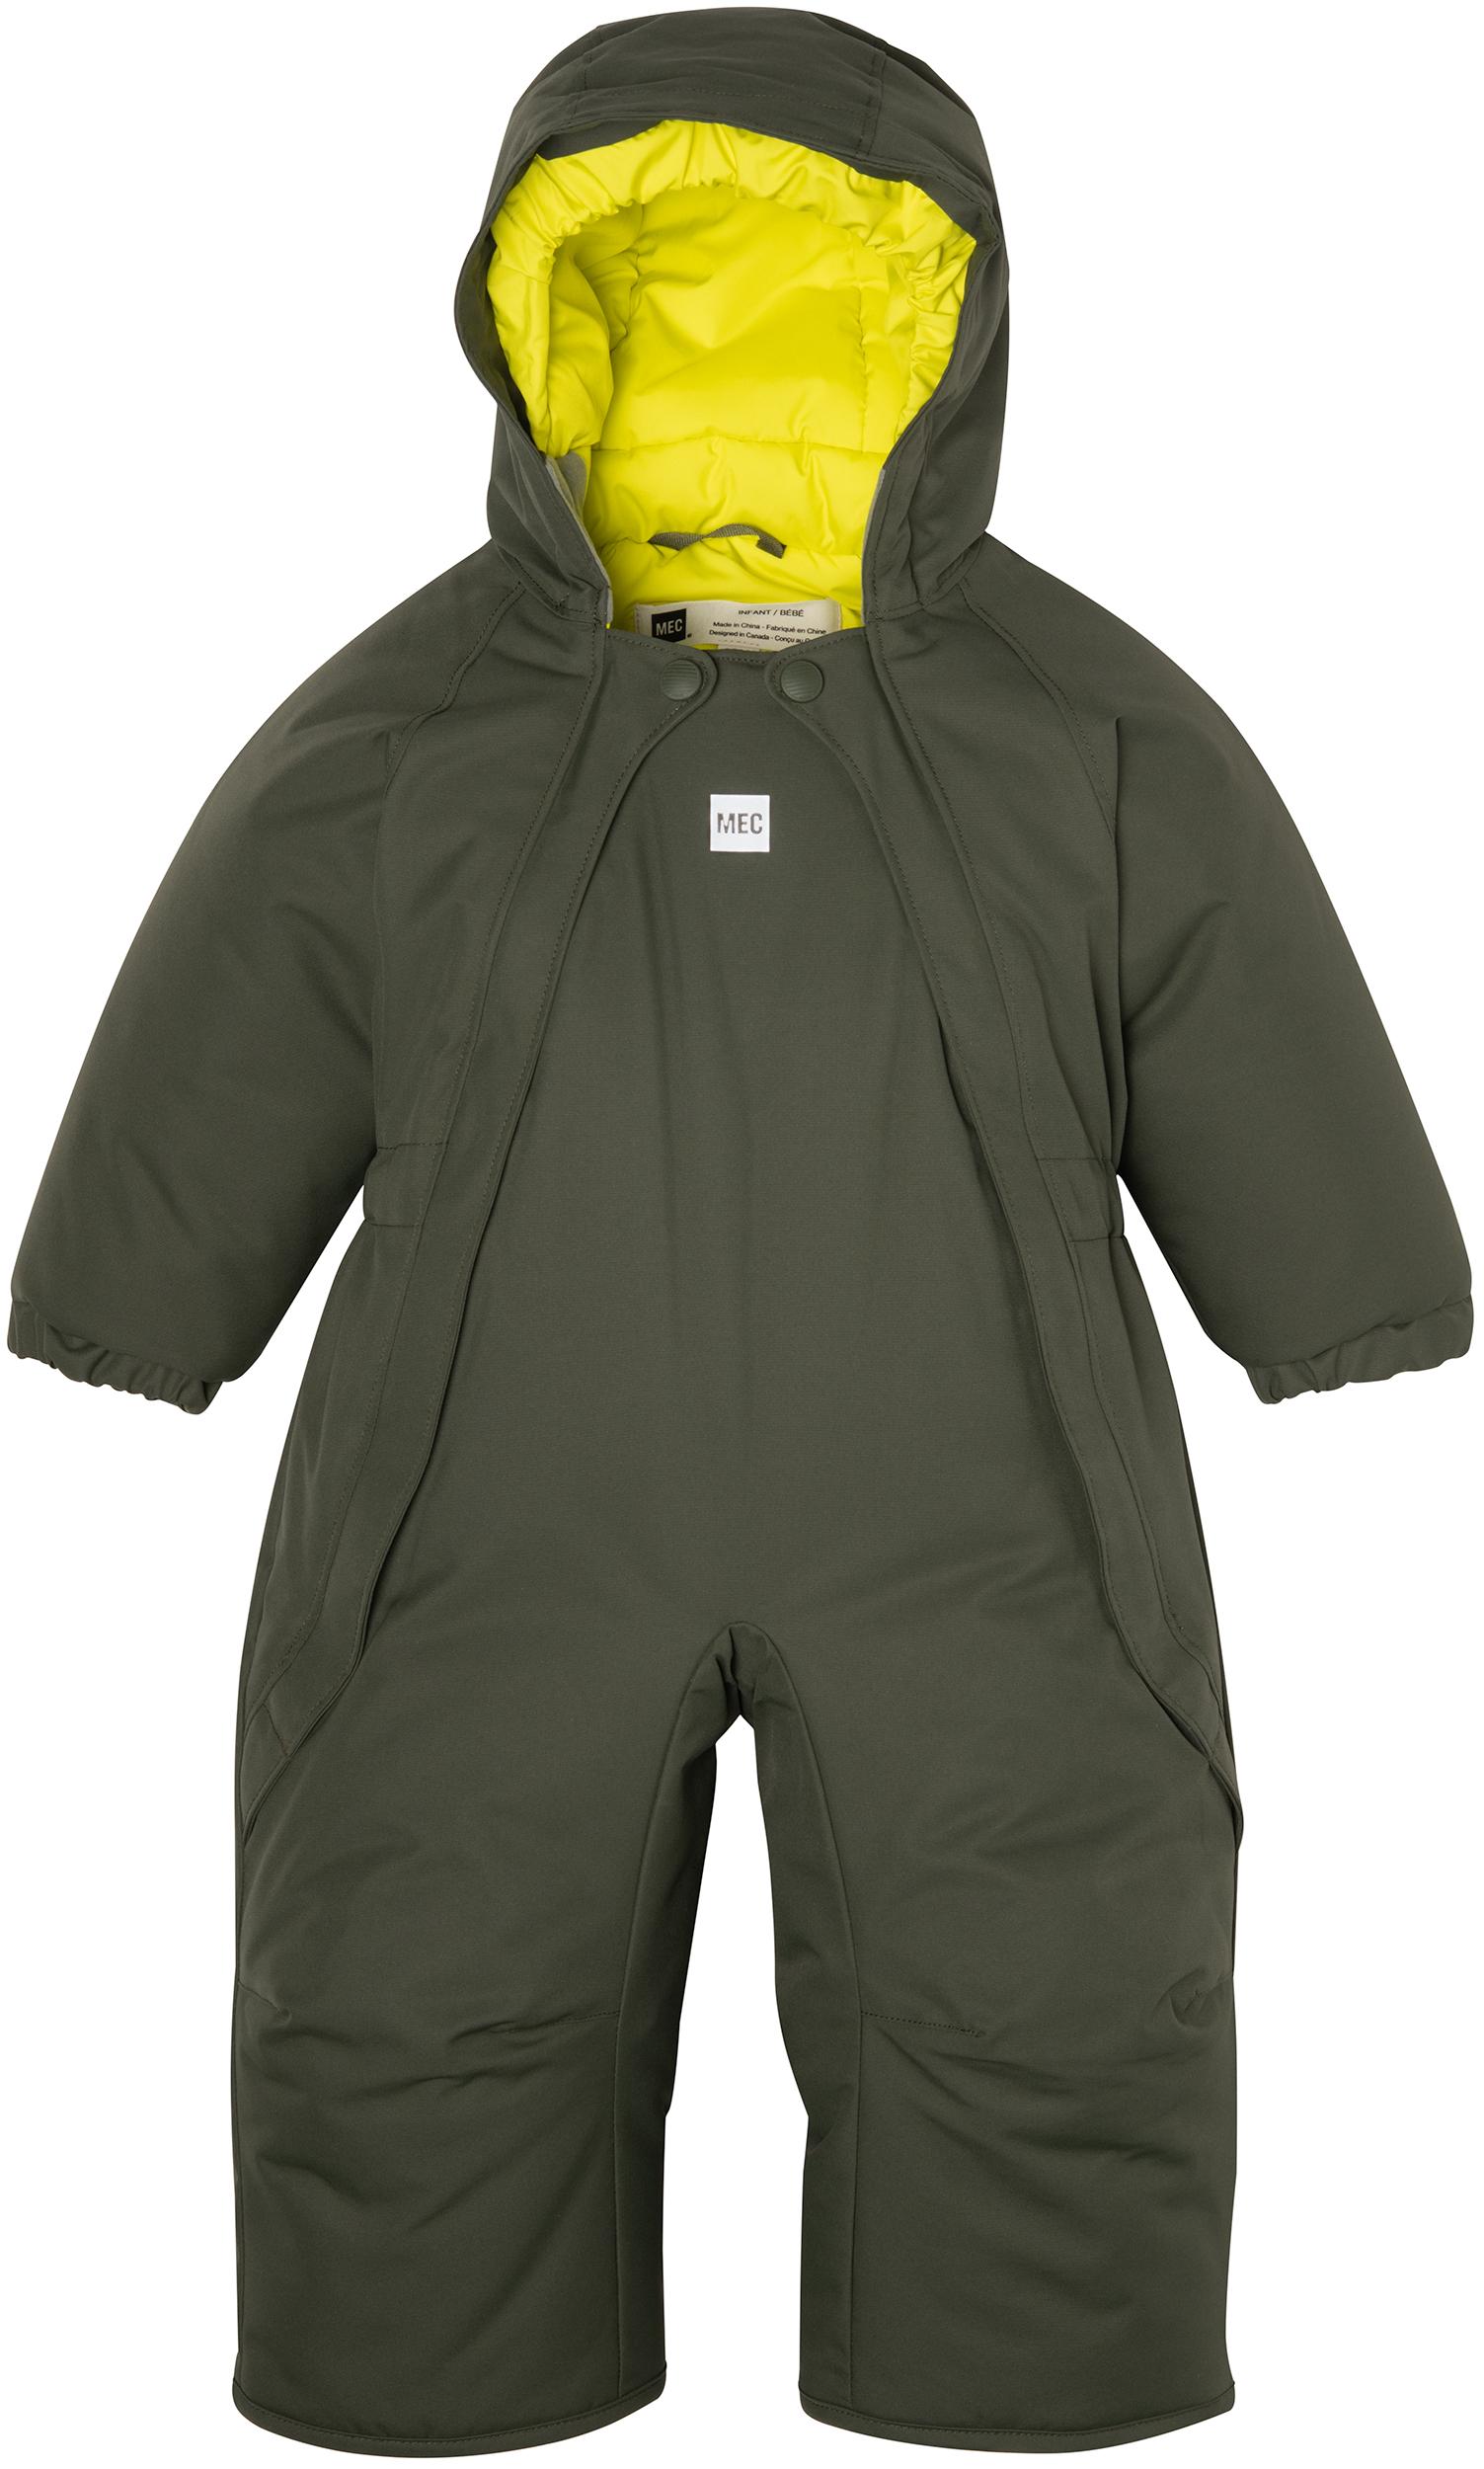 22c7dba06 MEC Toaster Bunting Suit - Infants